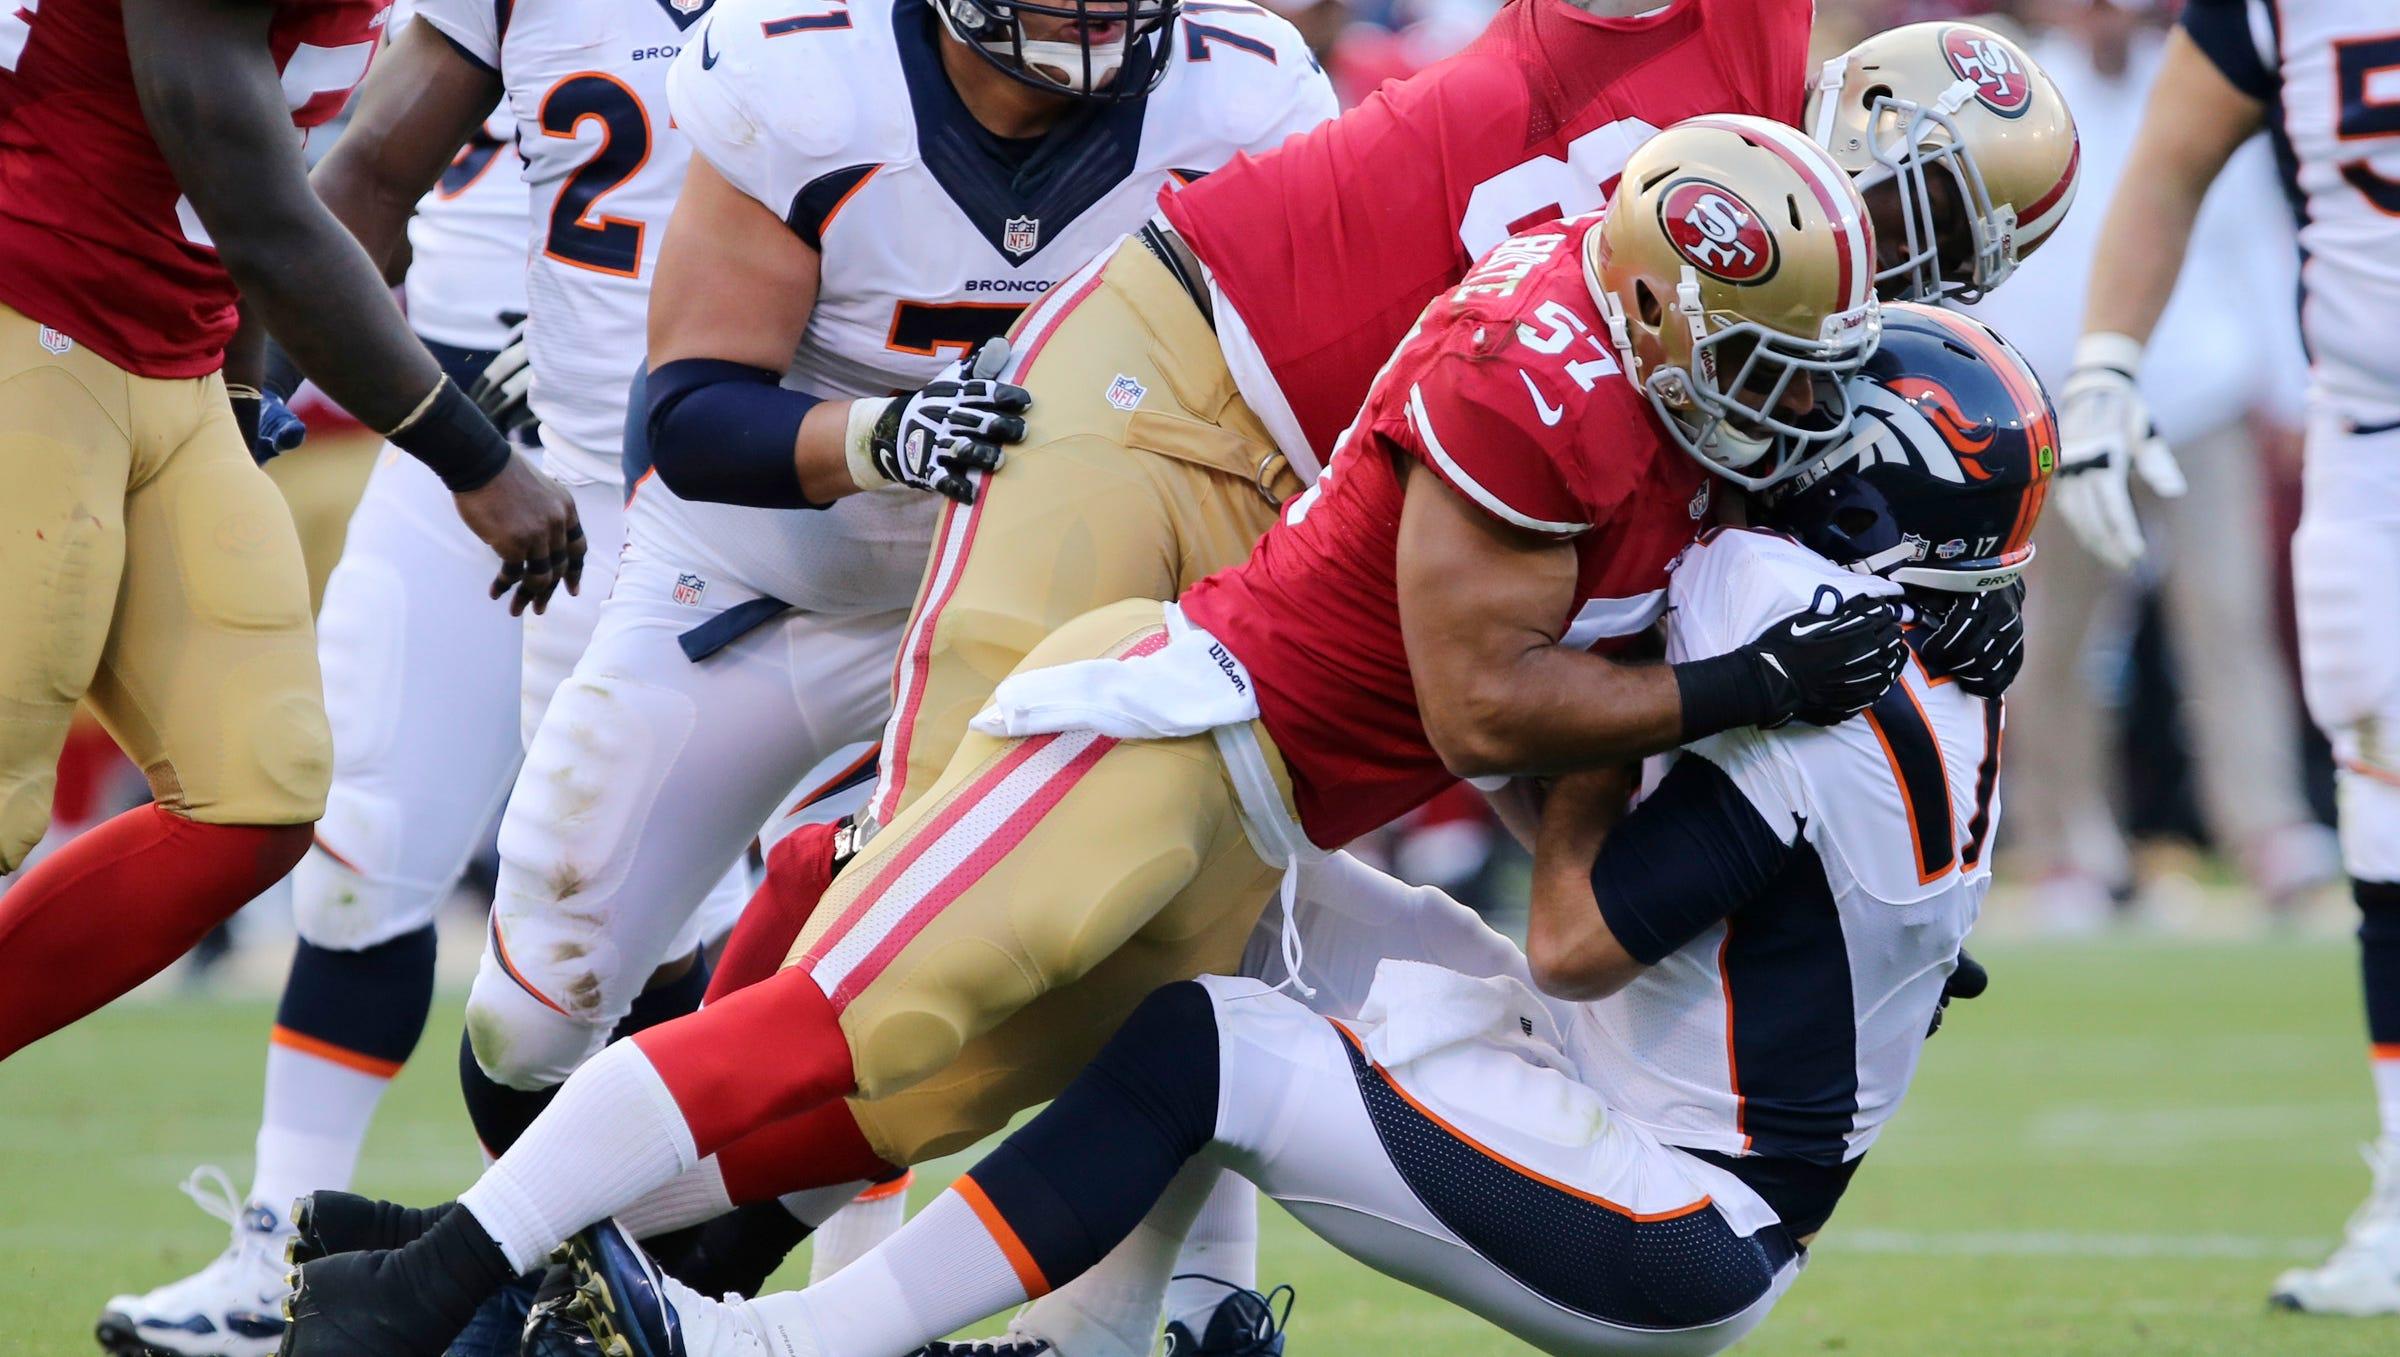 San Francisco 49ers linebacker Michael Wilhoite (57) and tight end Demarcus Dobbs (83) sack Denver Broncos quarterback Brock Osweiler (17) during the second quarter at Candlestick Park.